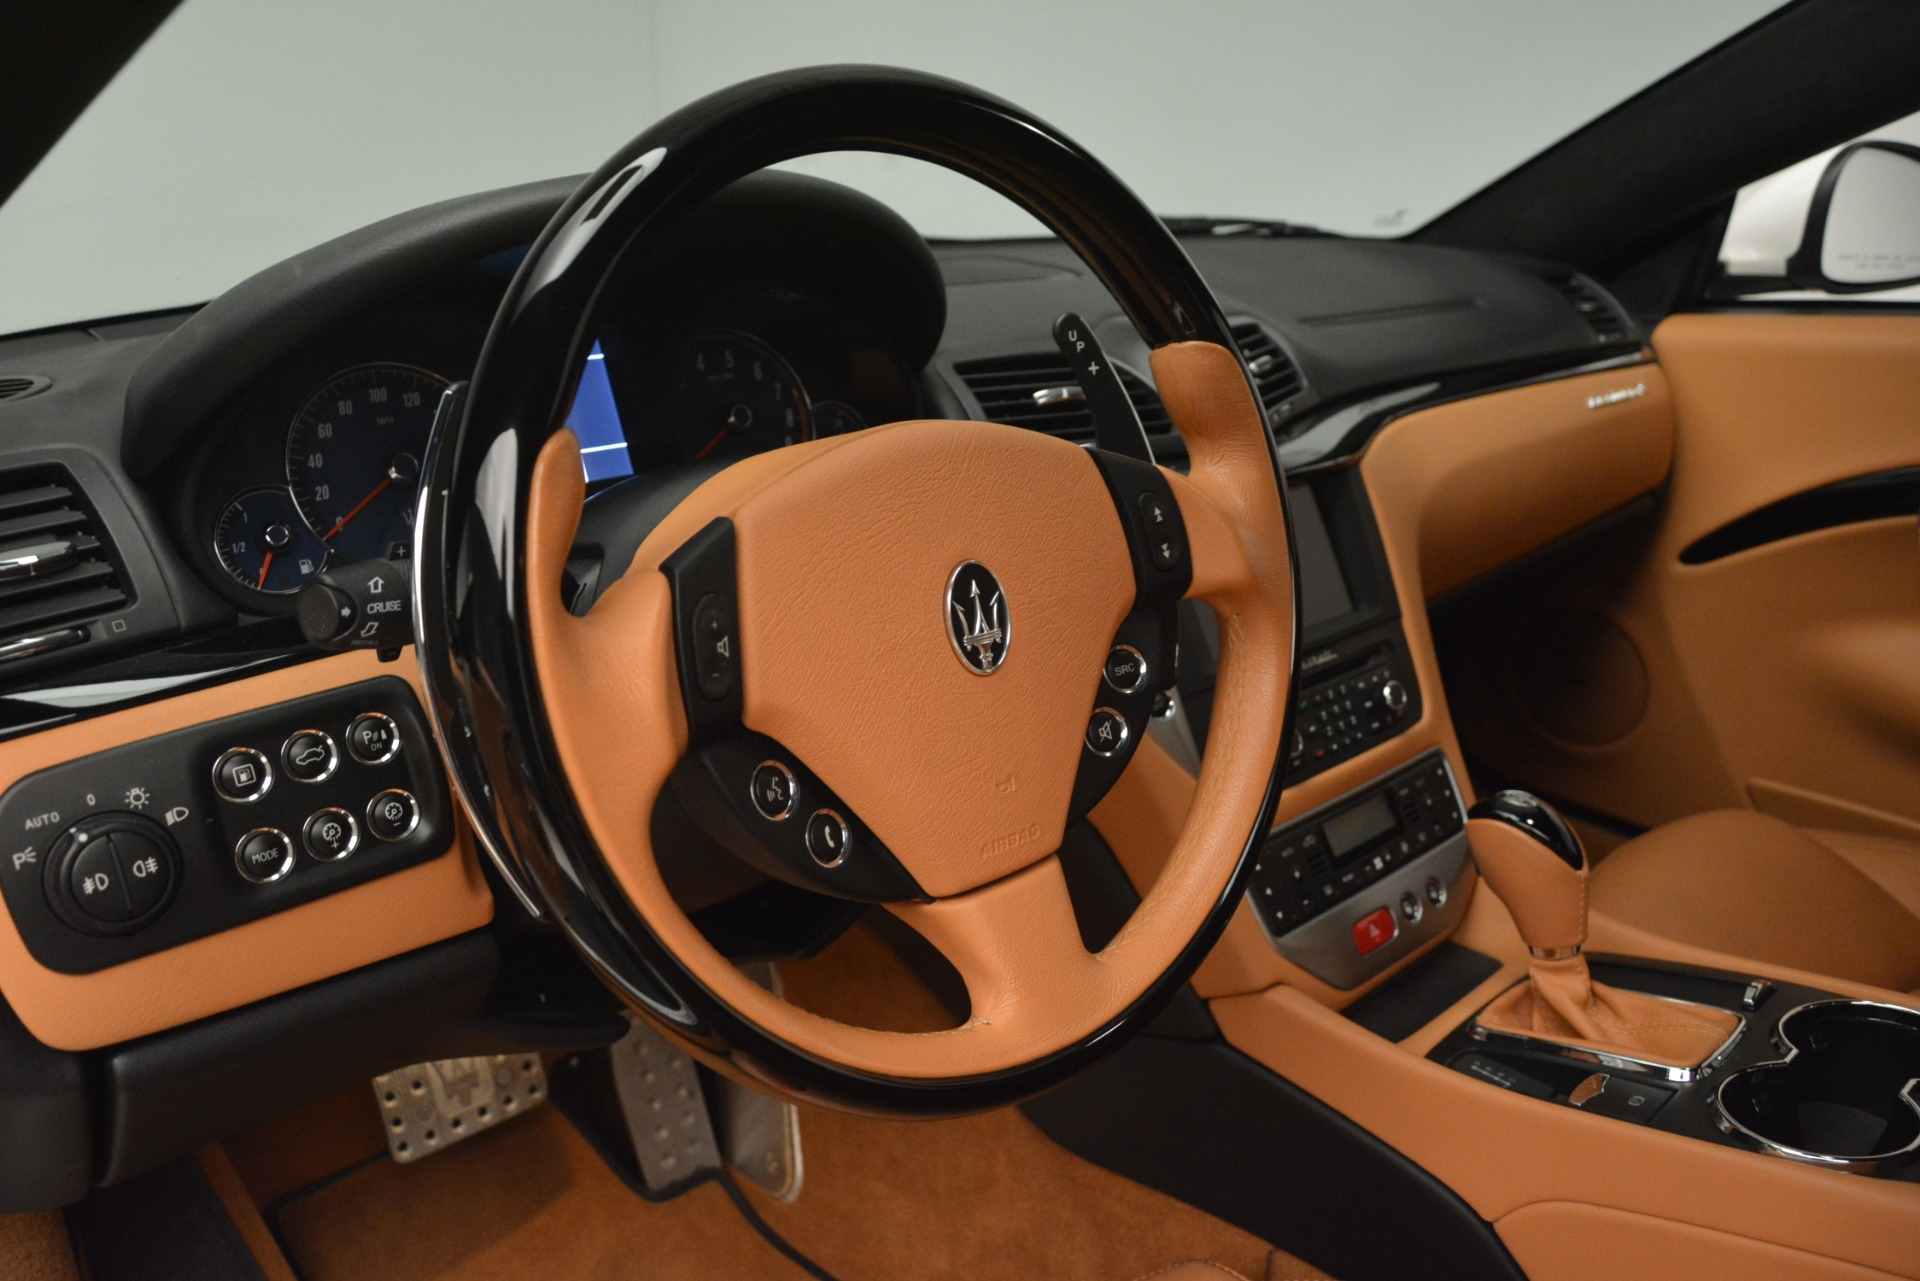 Used 2011 Maserati GranTurismo S Automatic For Sale In Westport, CT 3061_p19